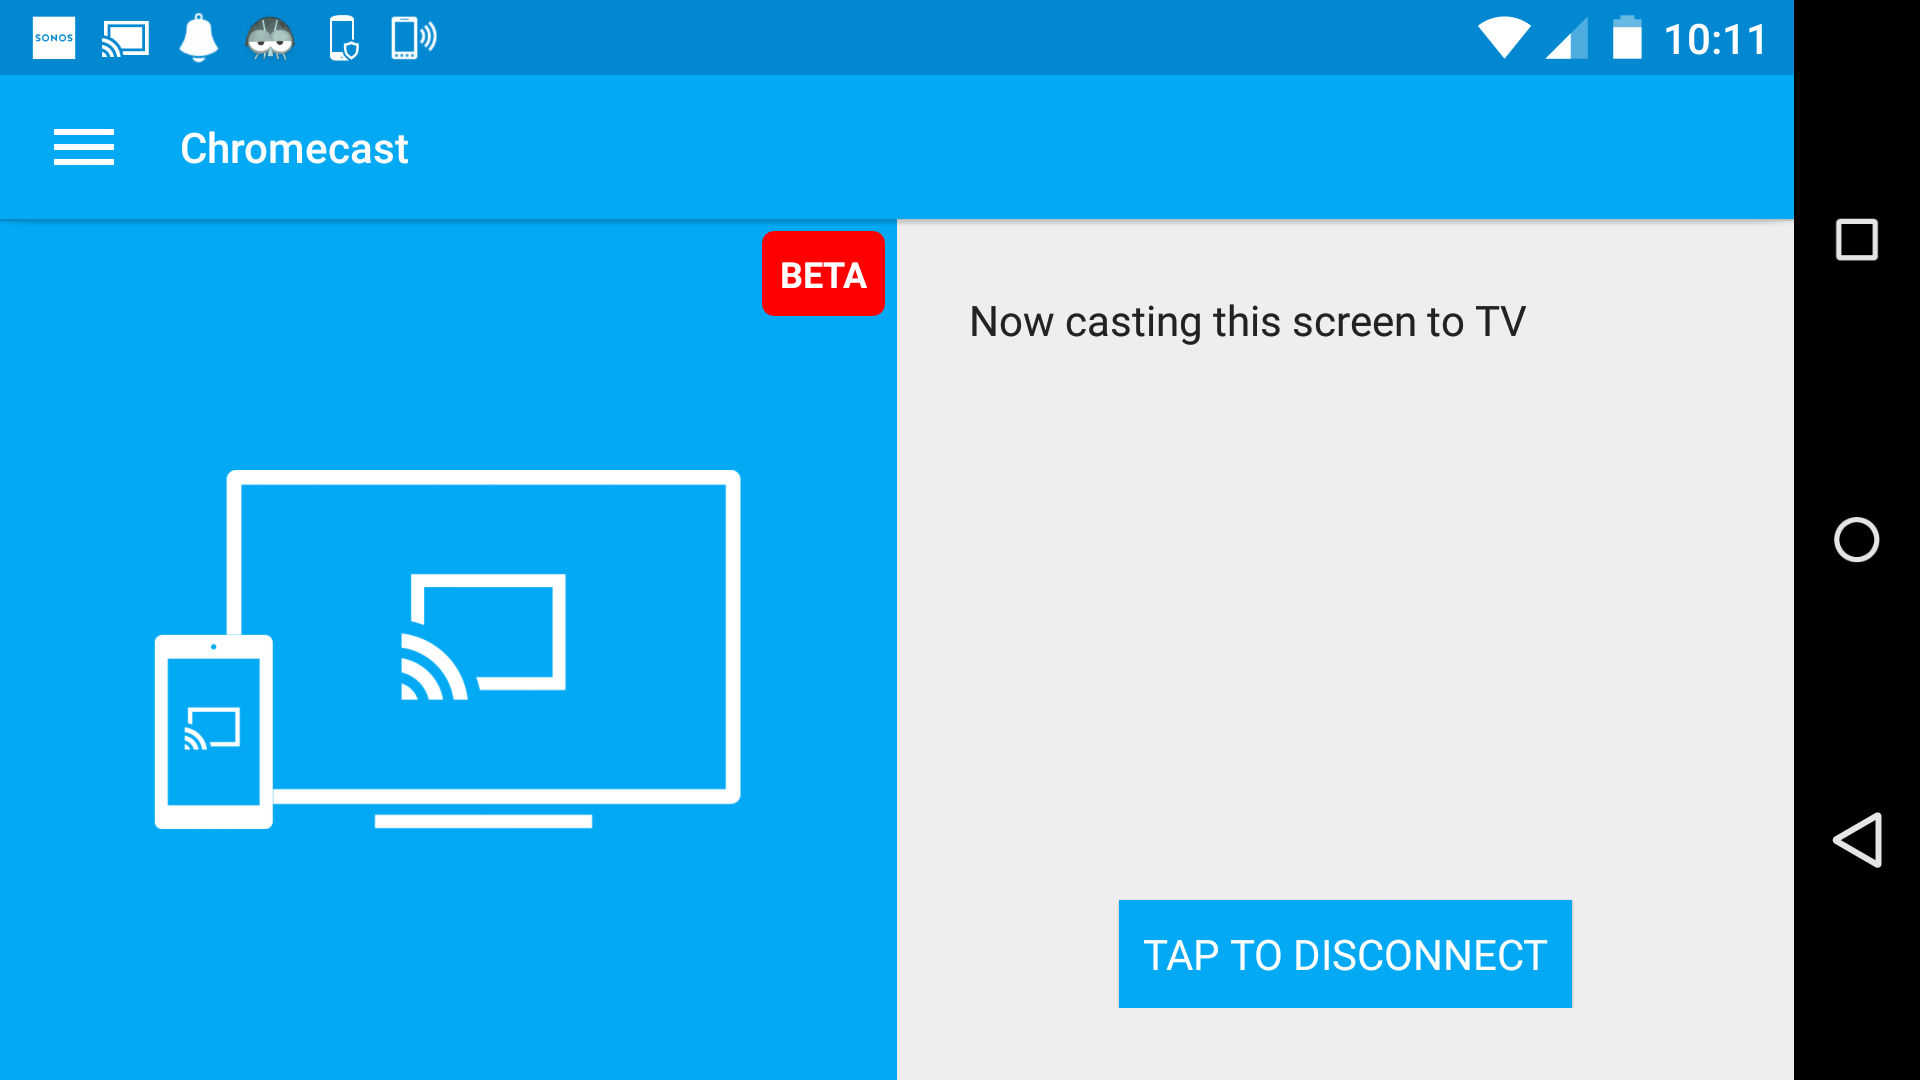 Mirror app for windows 10   Microsoft's new app will allow